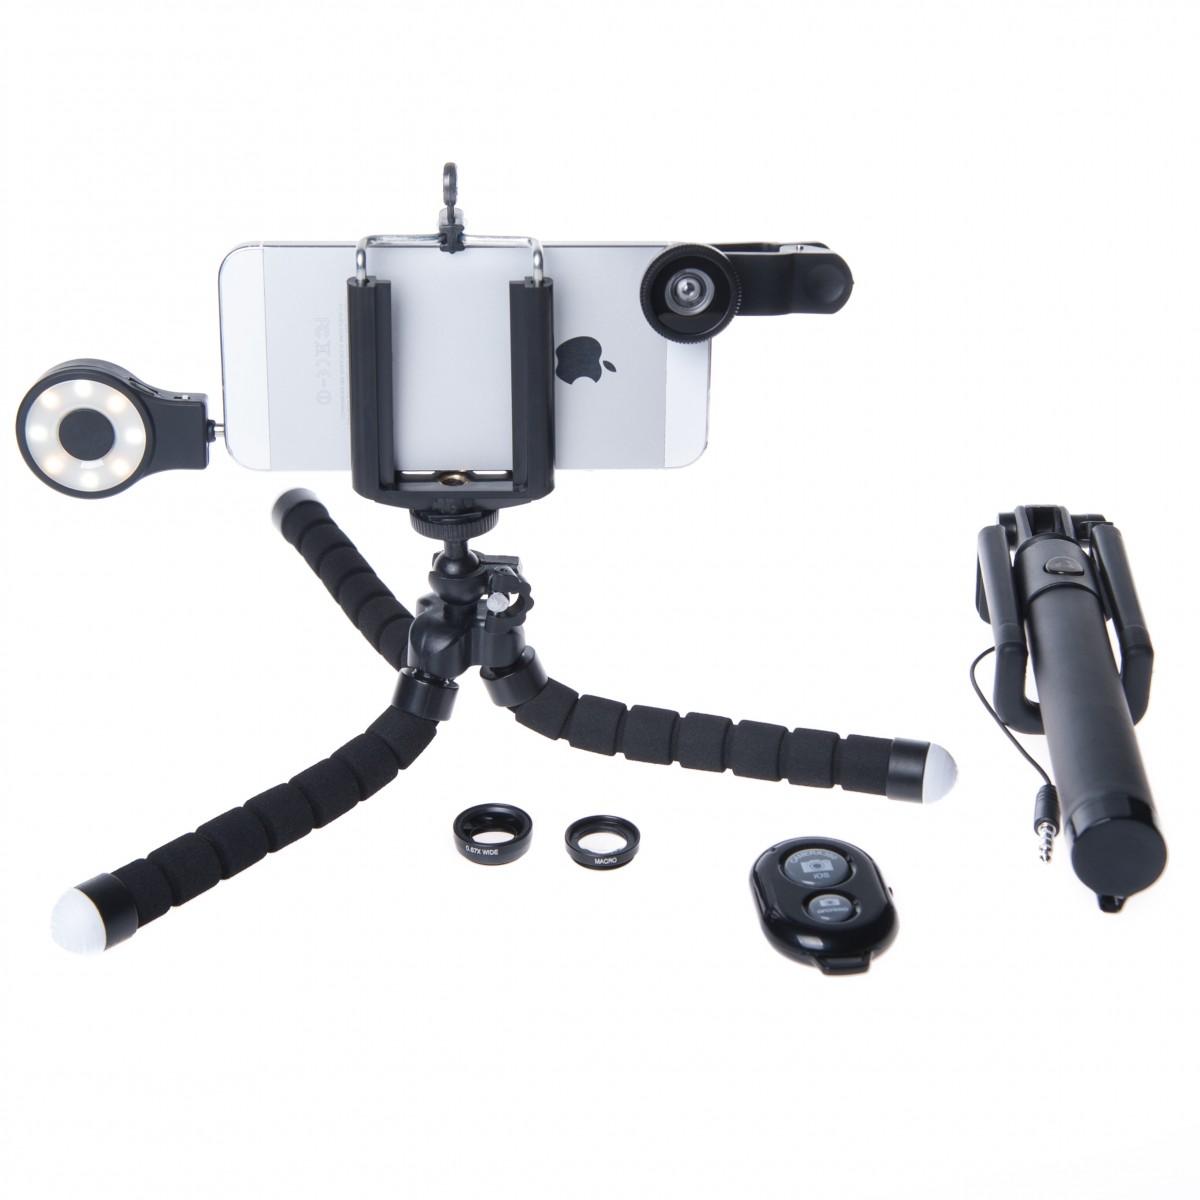 Photography Kit for Samsung Galaxy J5 Prime: Phone Lens, Tripod, Selfie,  stick, Remote, Flash